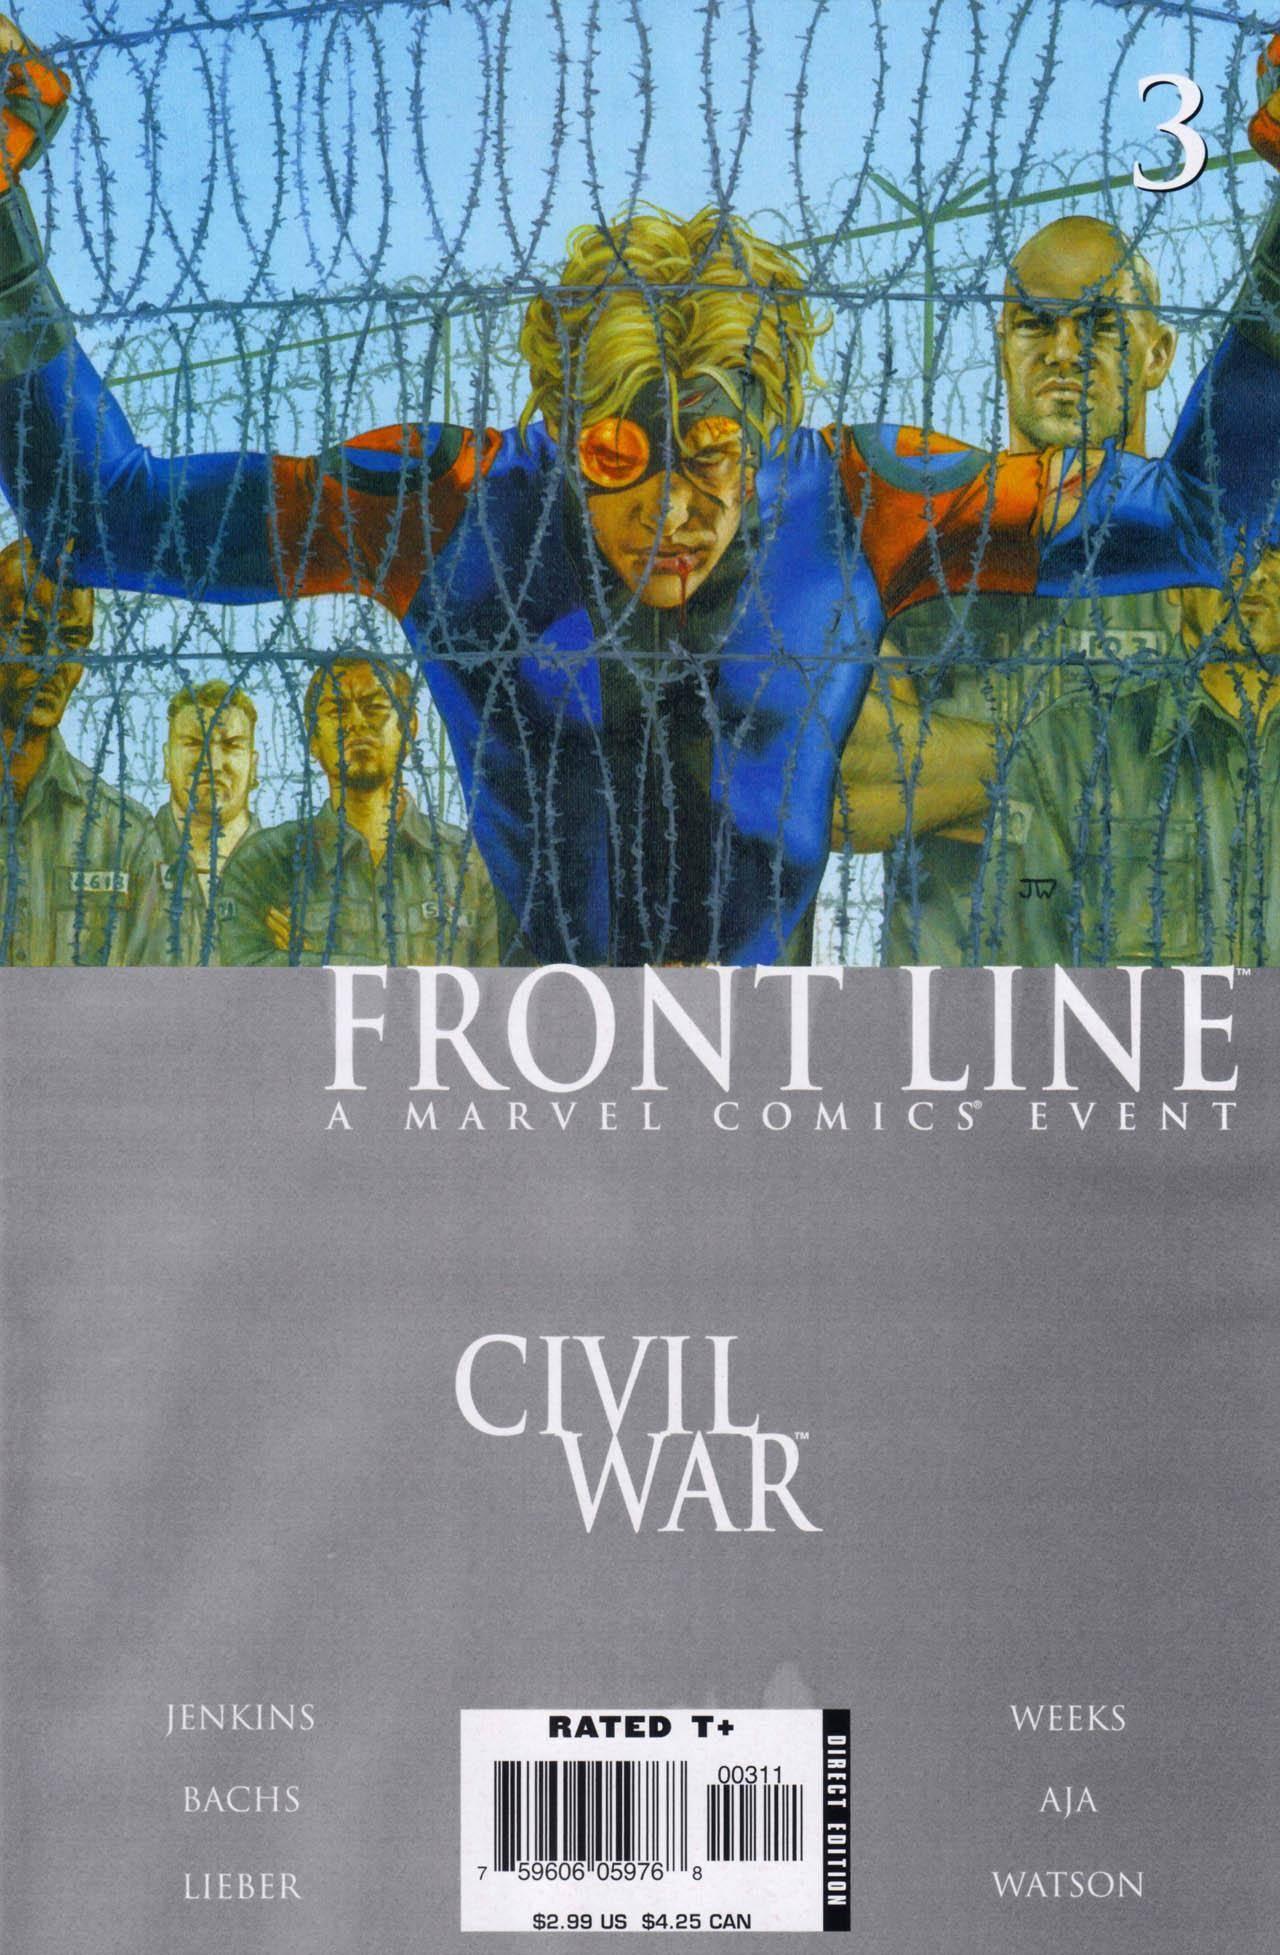 Civil War - Frontline 03